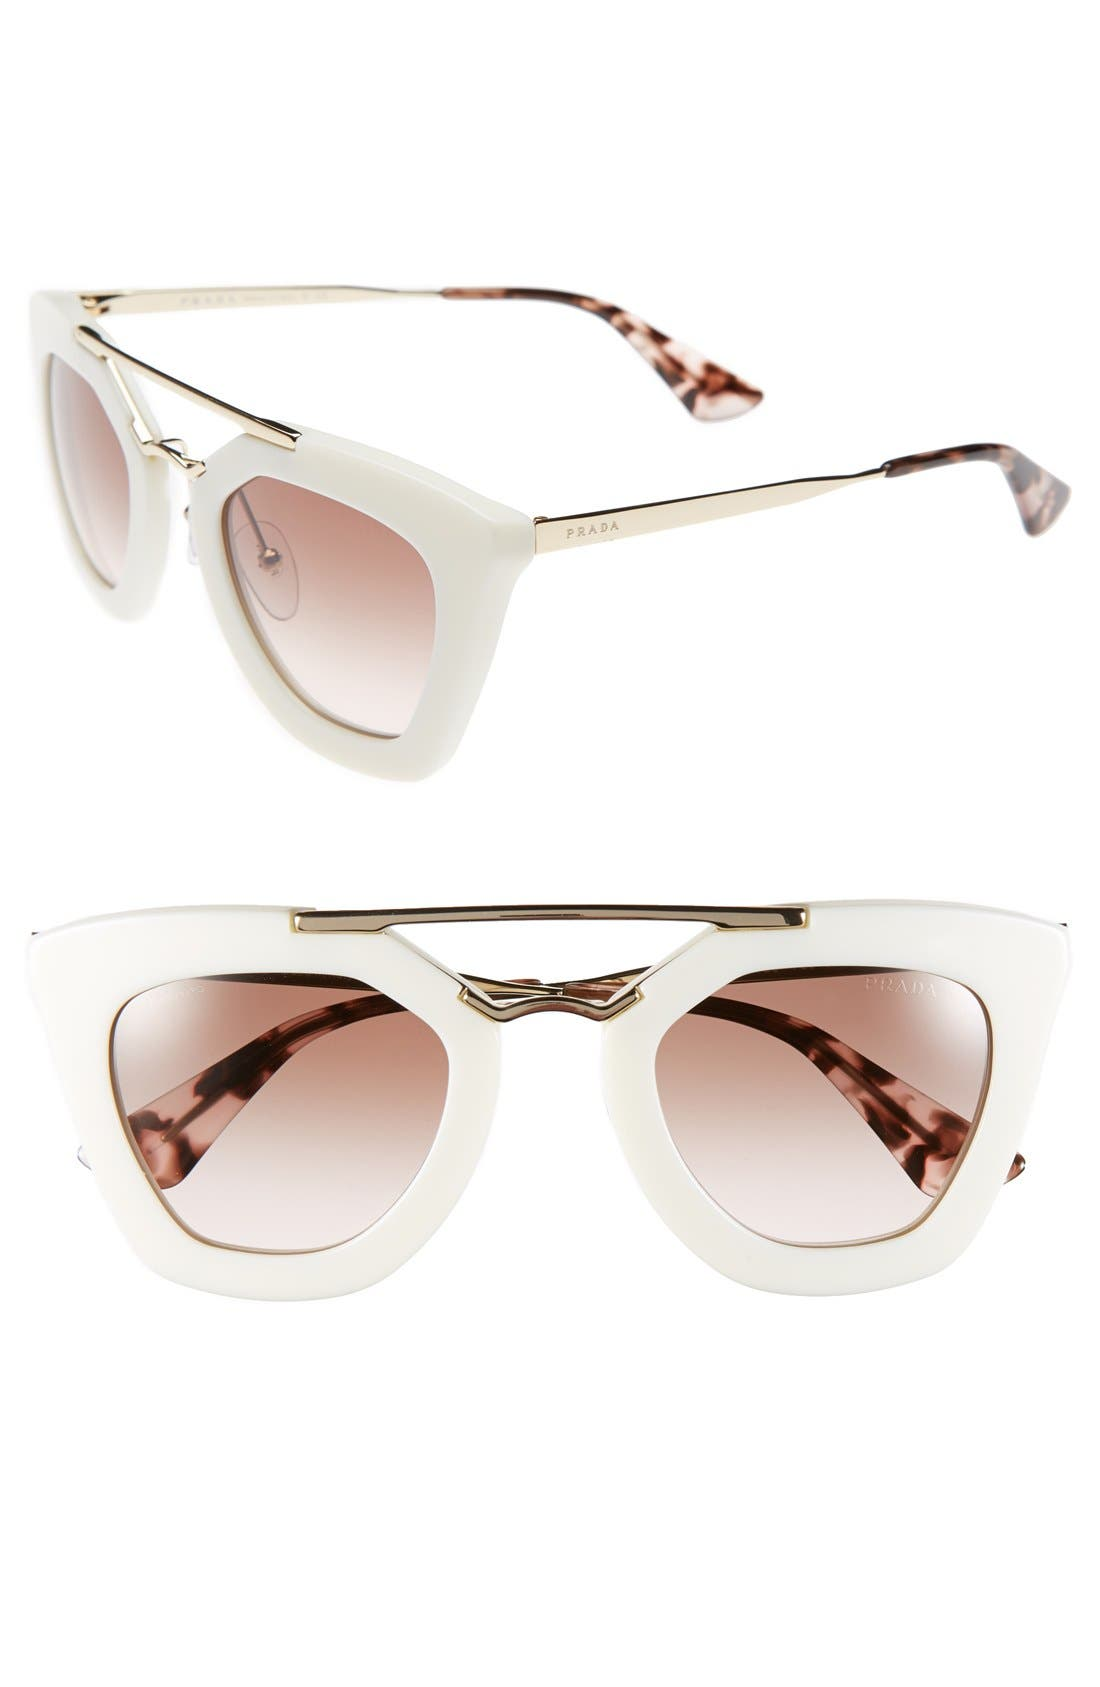 Alternate Image 1 Selected - Prada 49mm Retro Sunglasses